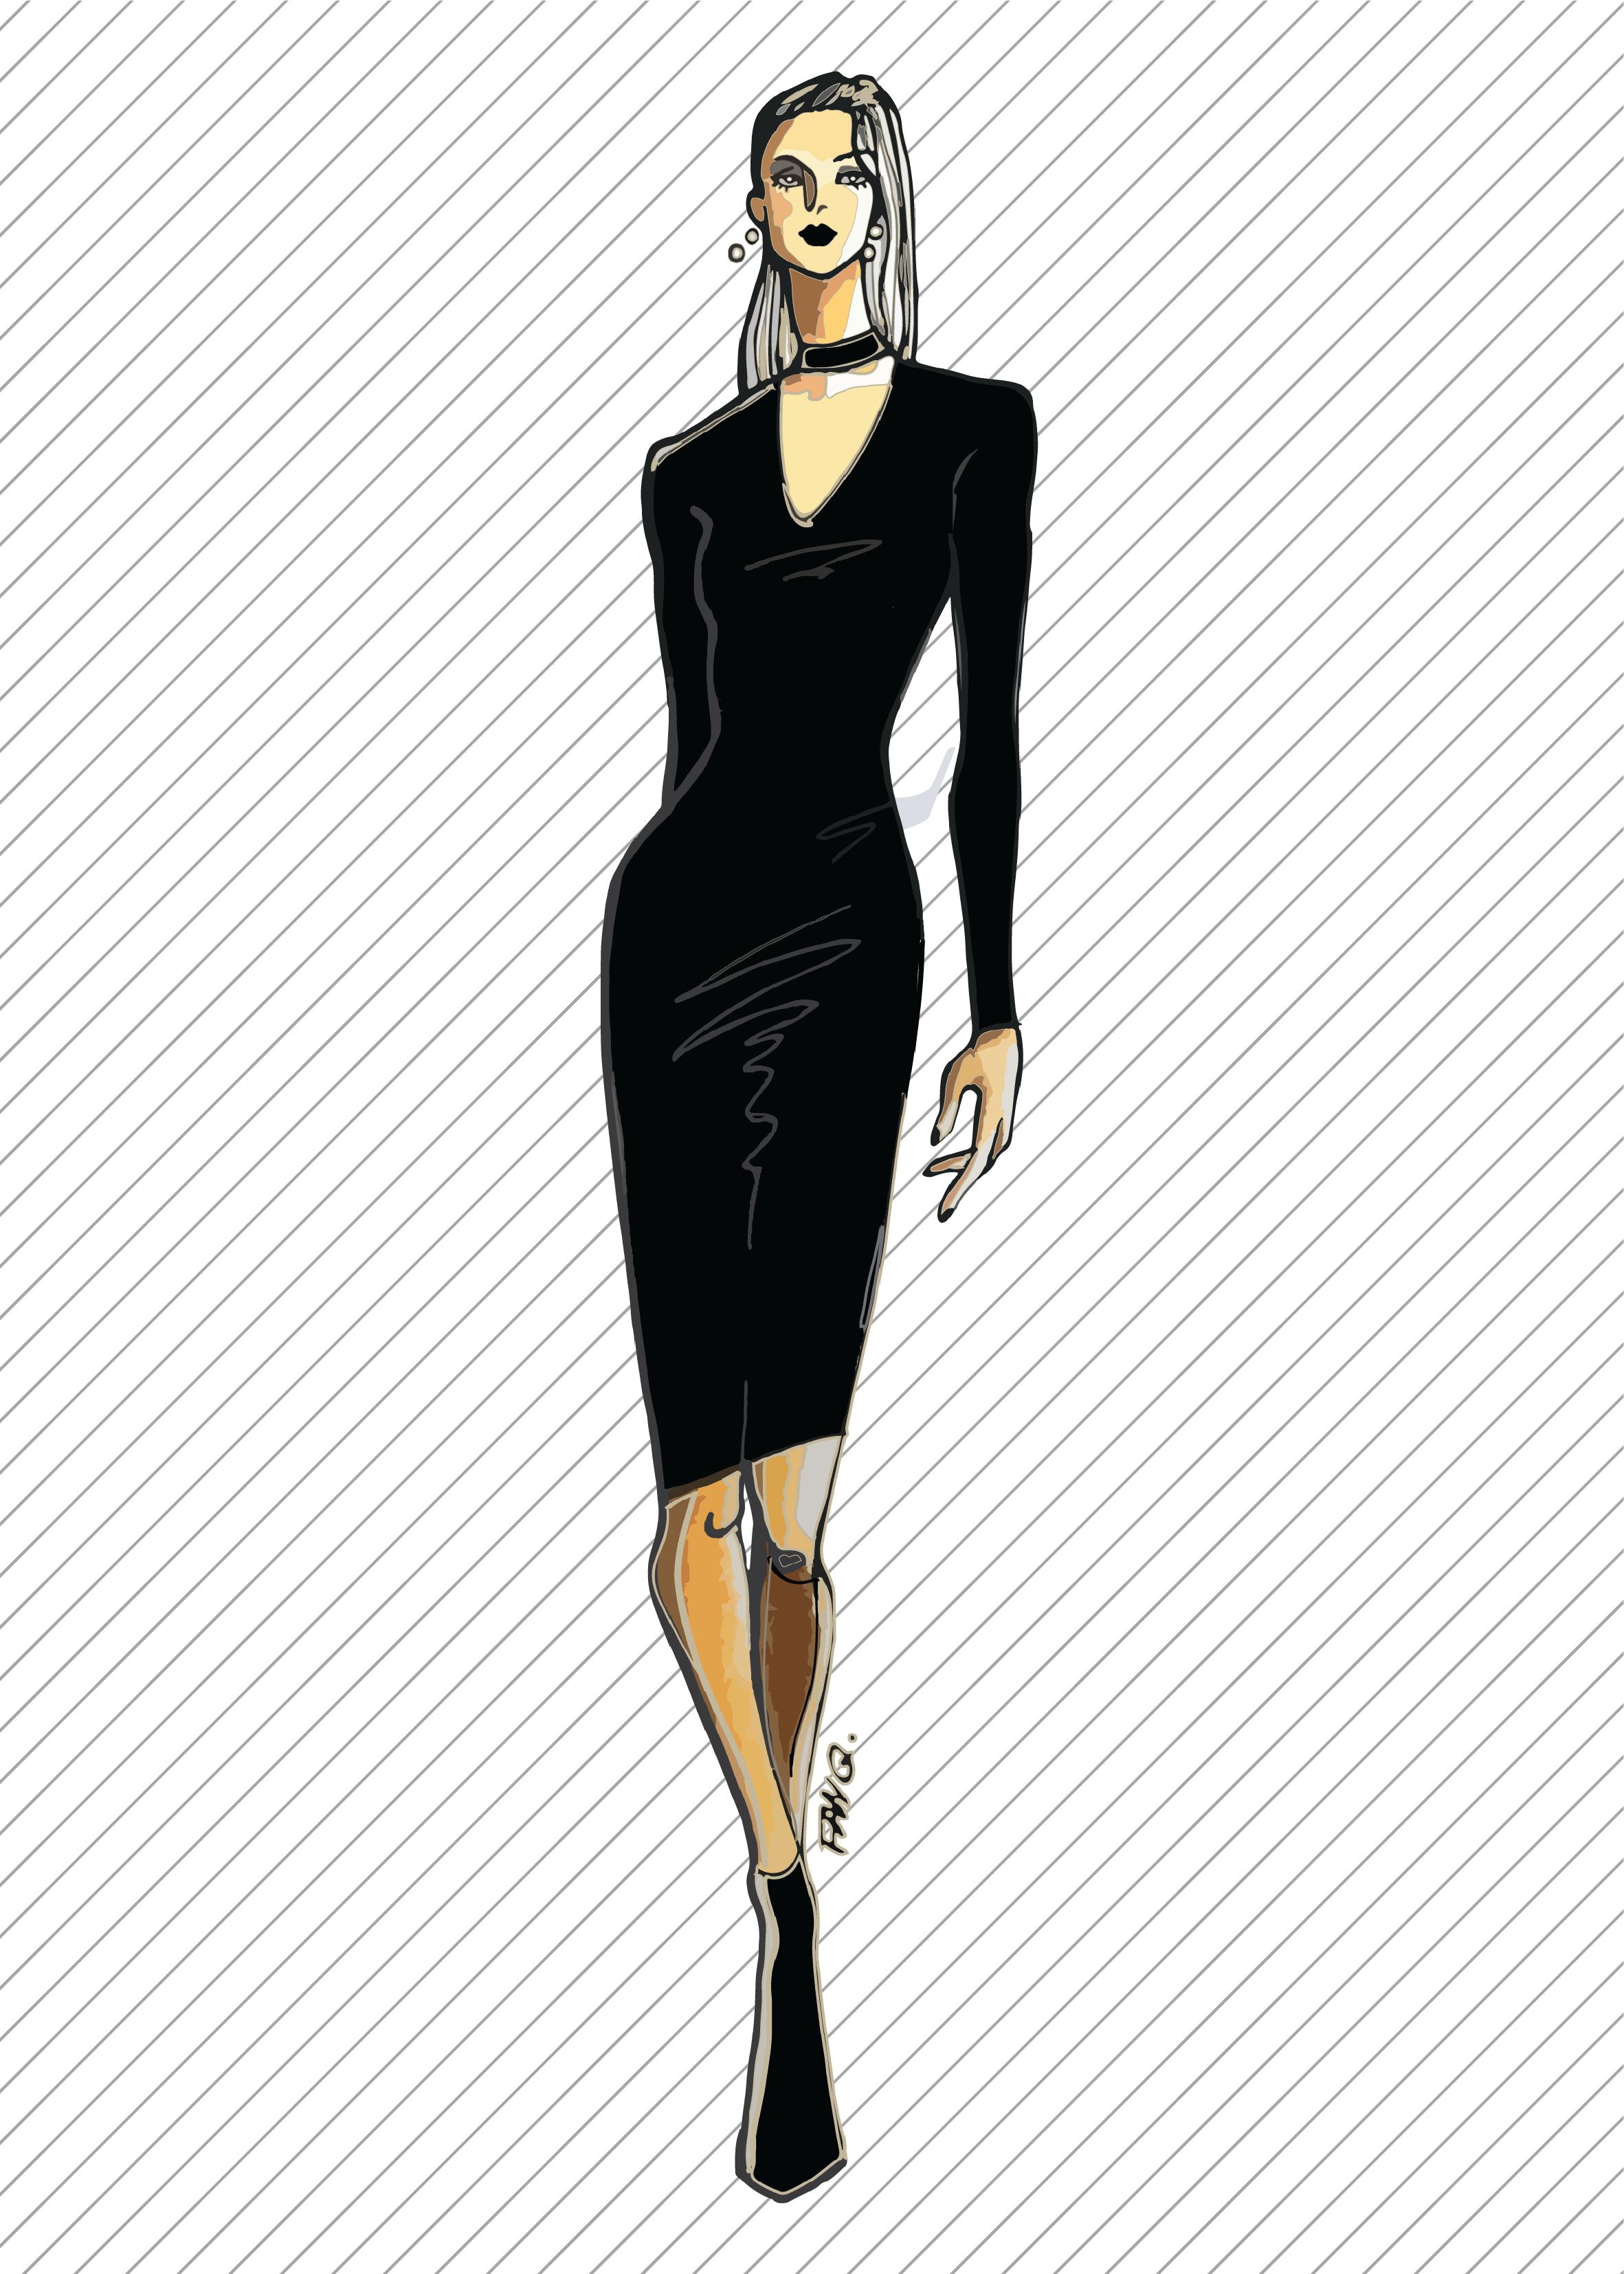 DR303 Robe tour de cou - Patron de couture PDF